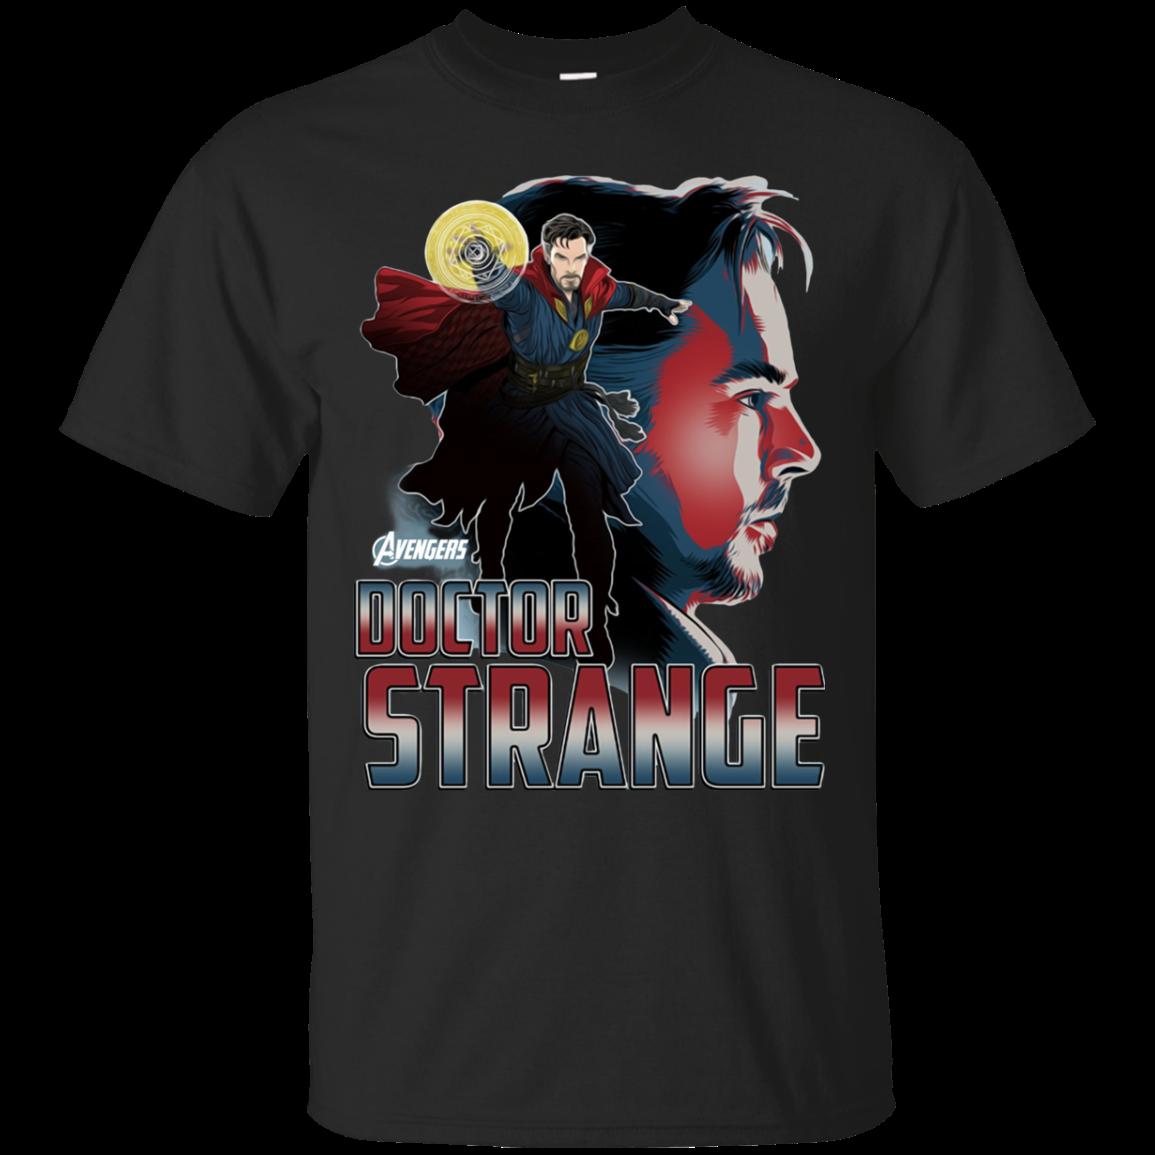 Avengers Infinity War Doctor Strange Head T shirt Hoodie Sweater Men